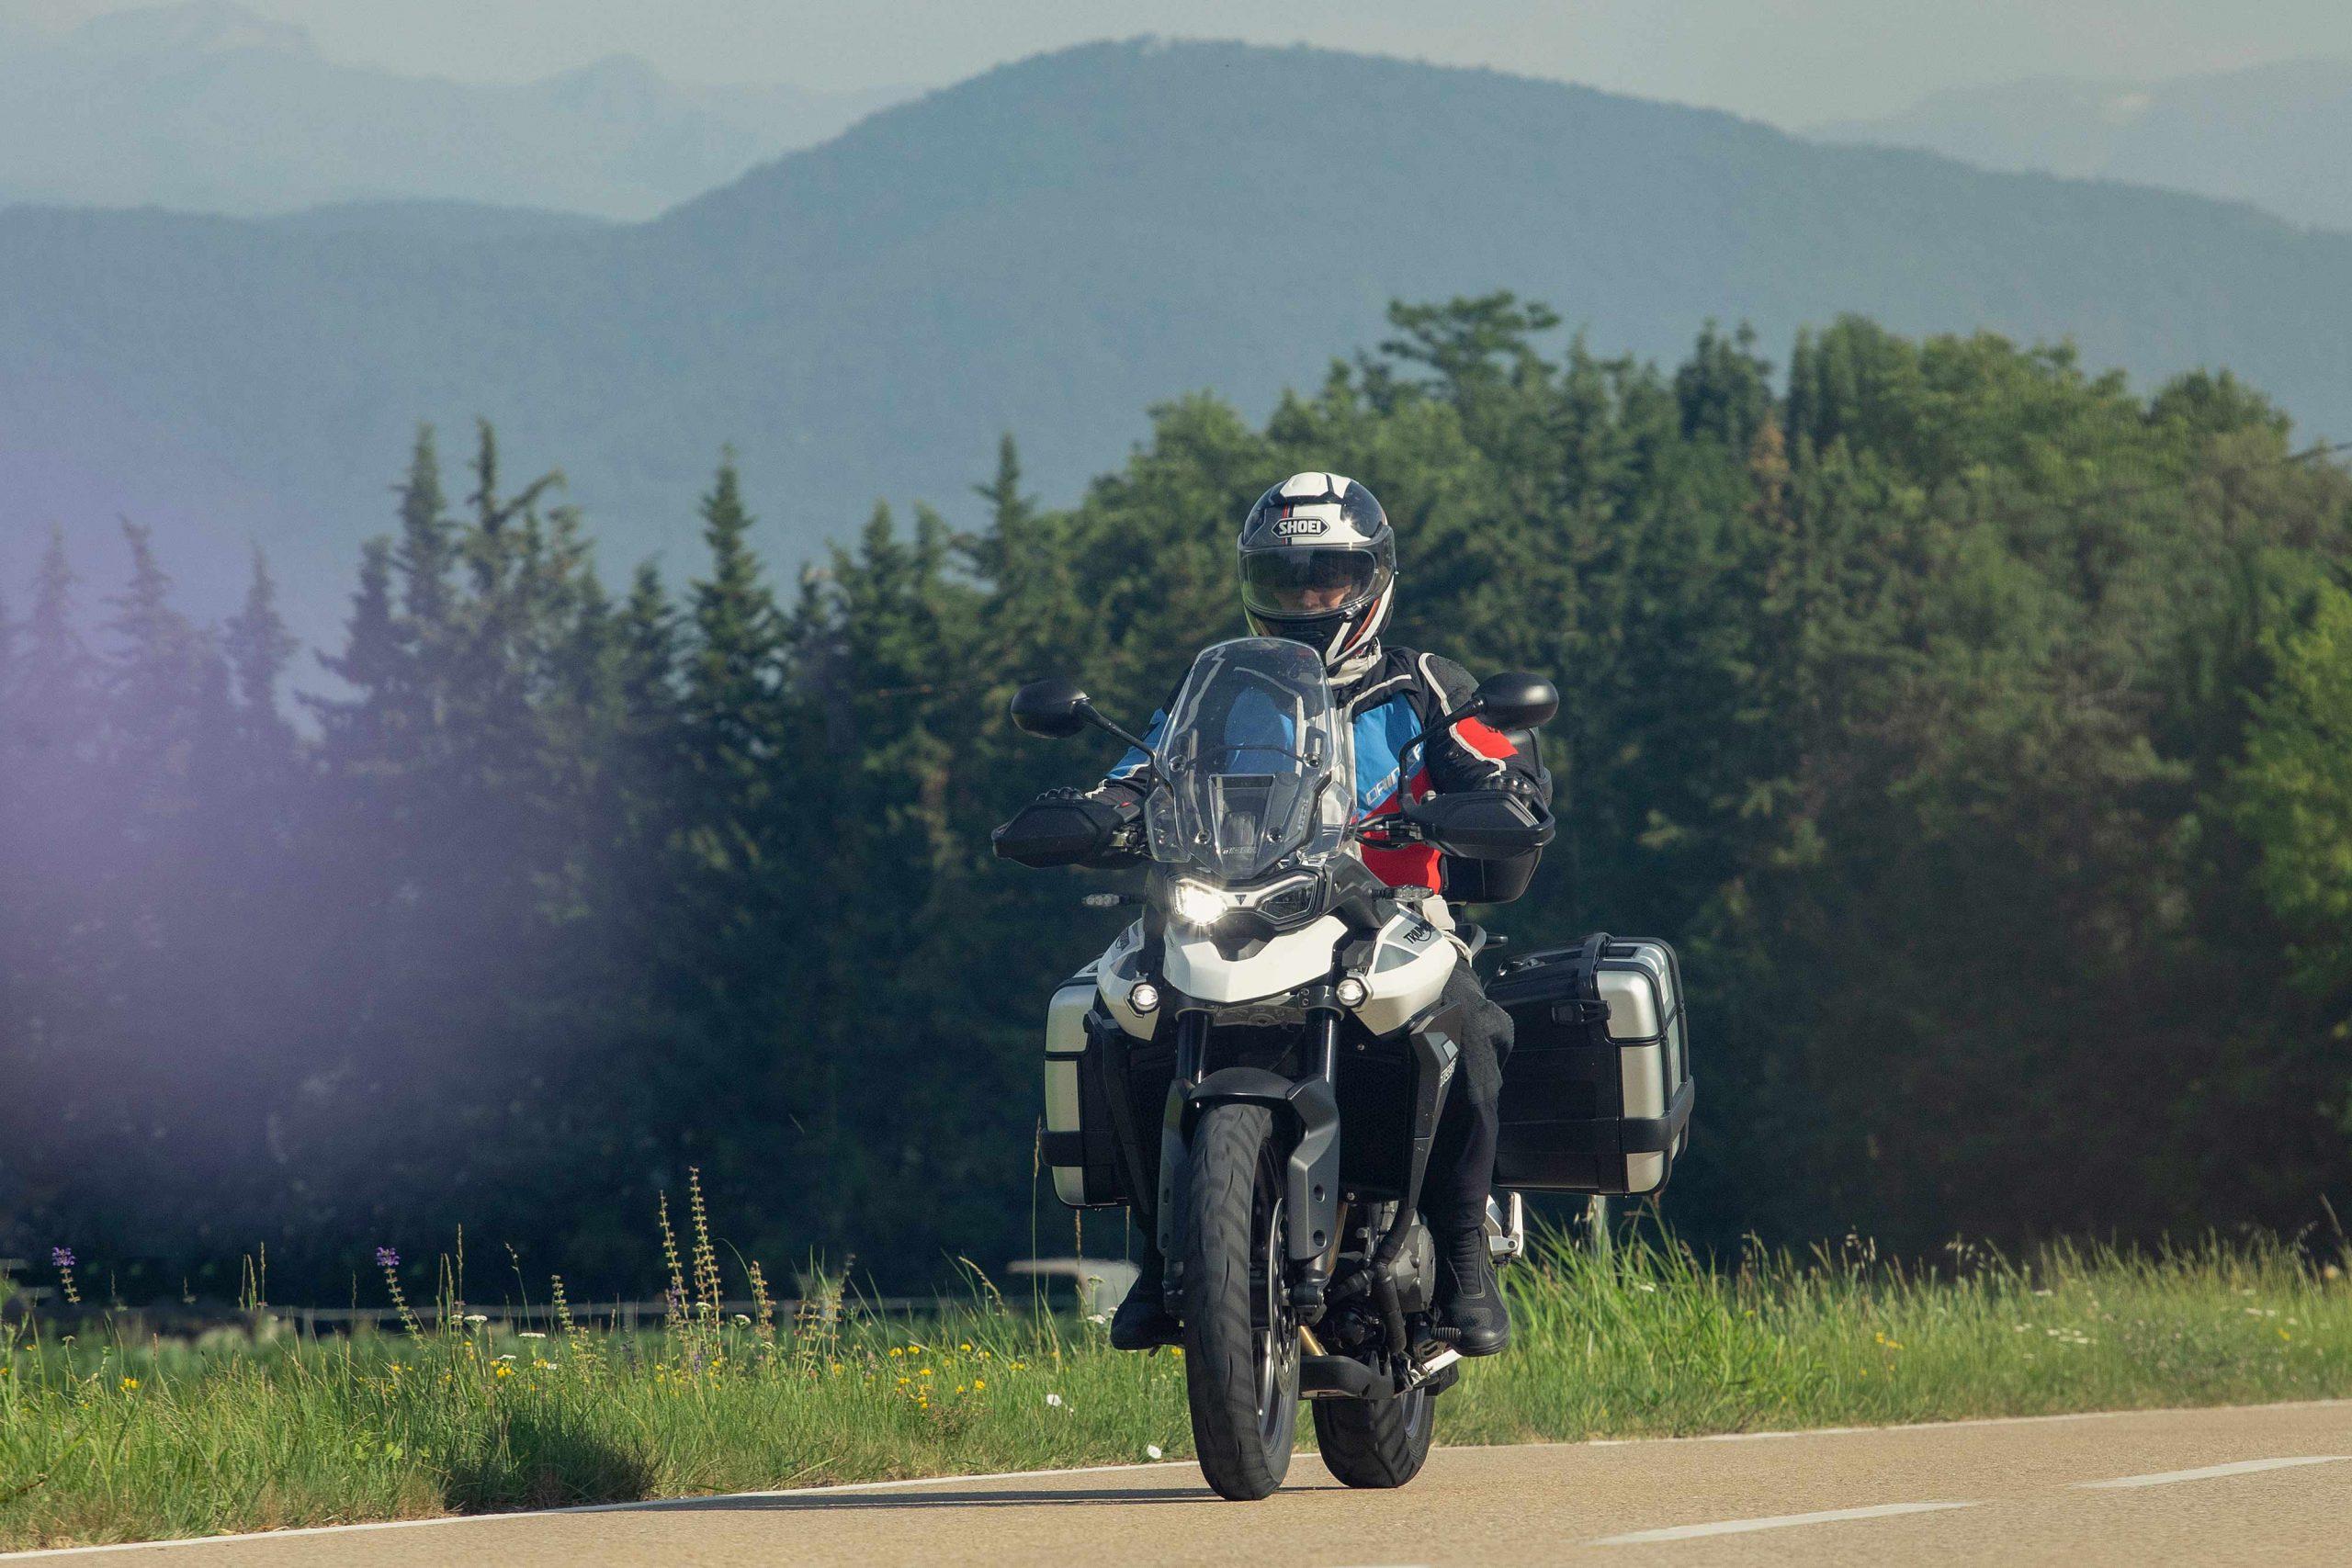 006_TriumphTiger-motosnet-mariapujol-fotografobarcelona